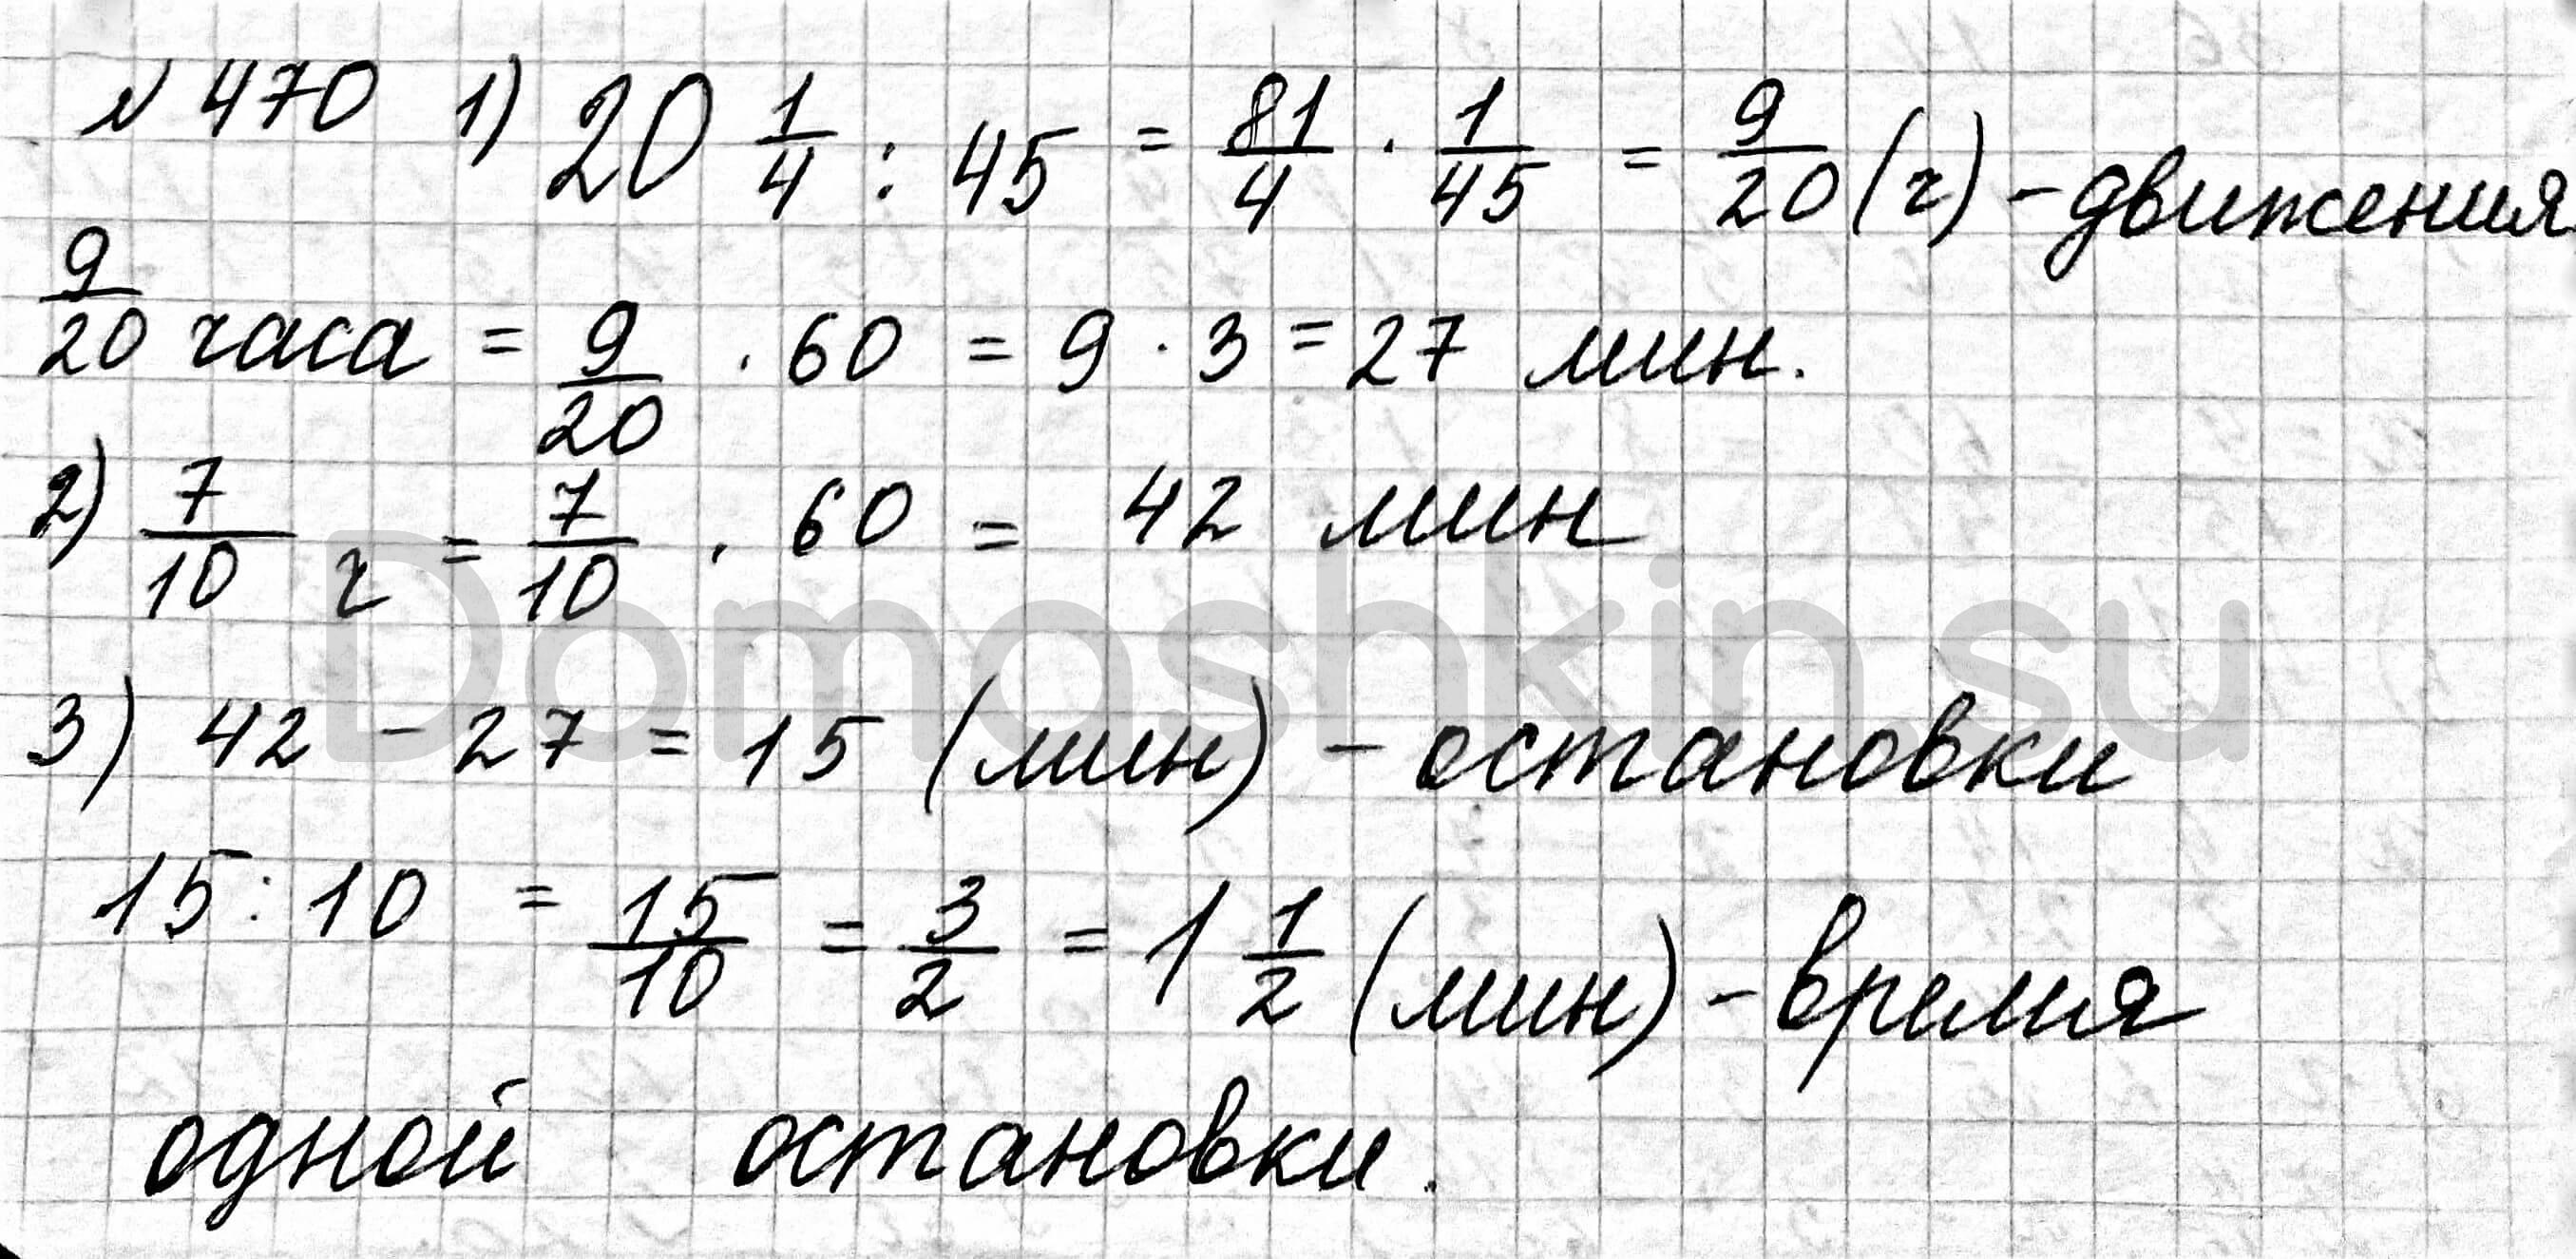 Математика 6 класс учебник Мерзляк номер 470 решение